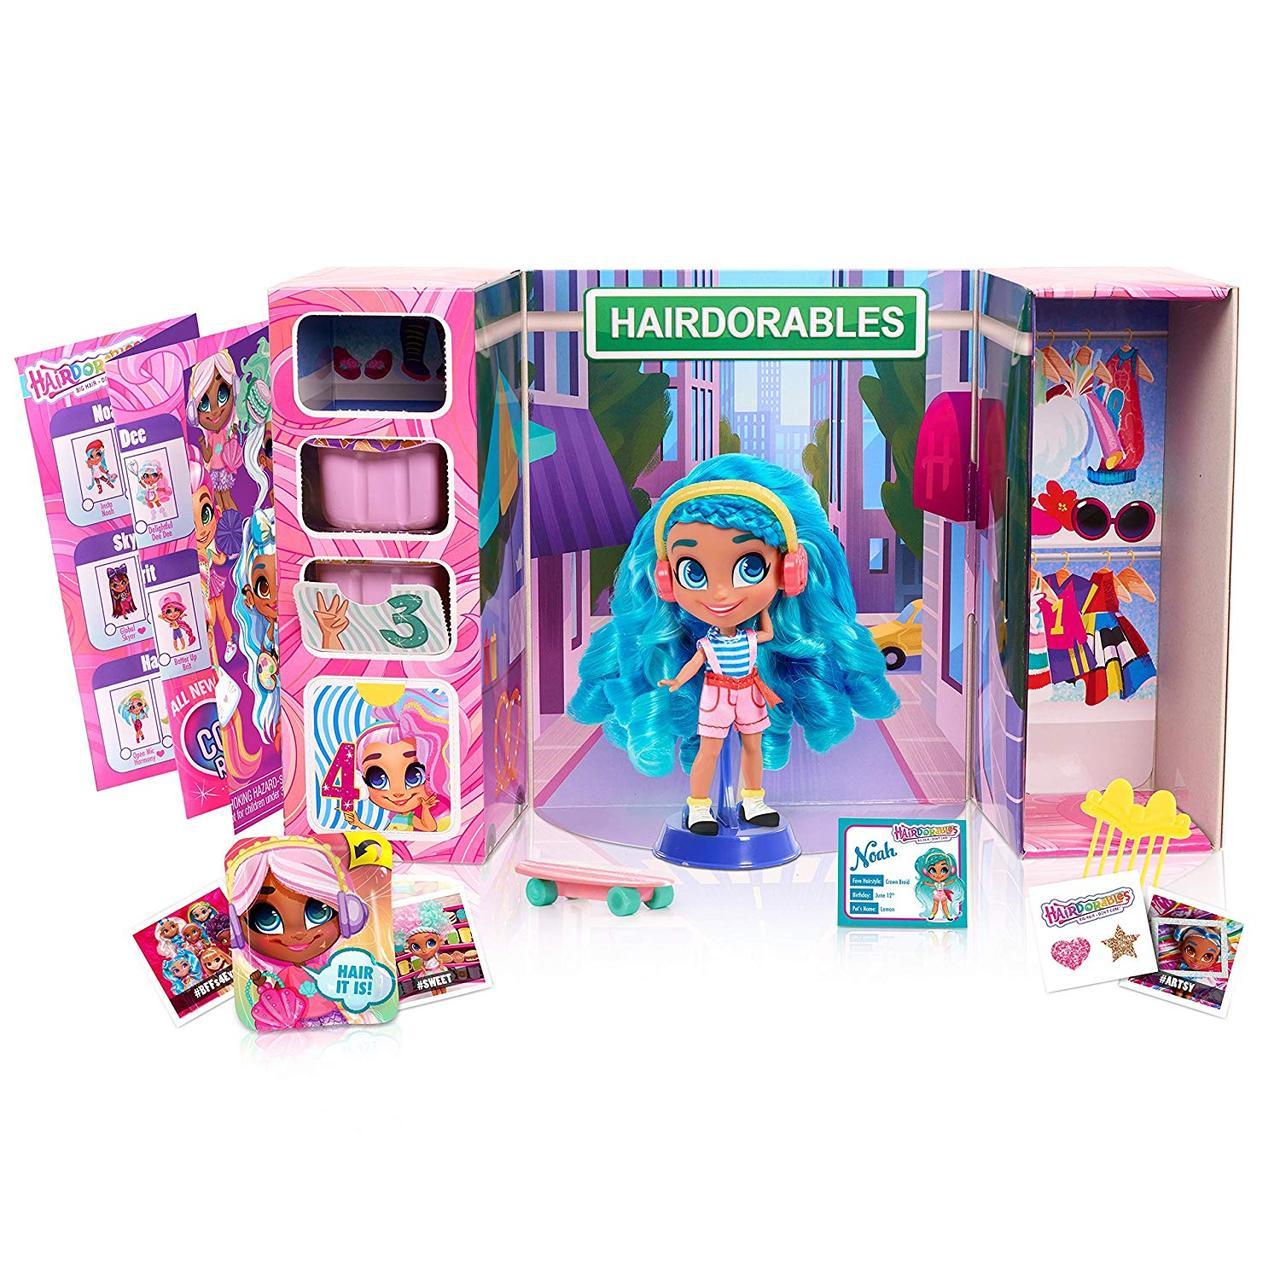 Кукла Хэрдораблс 2 серия Hairdorables Dolls Series 2